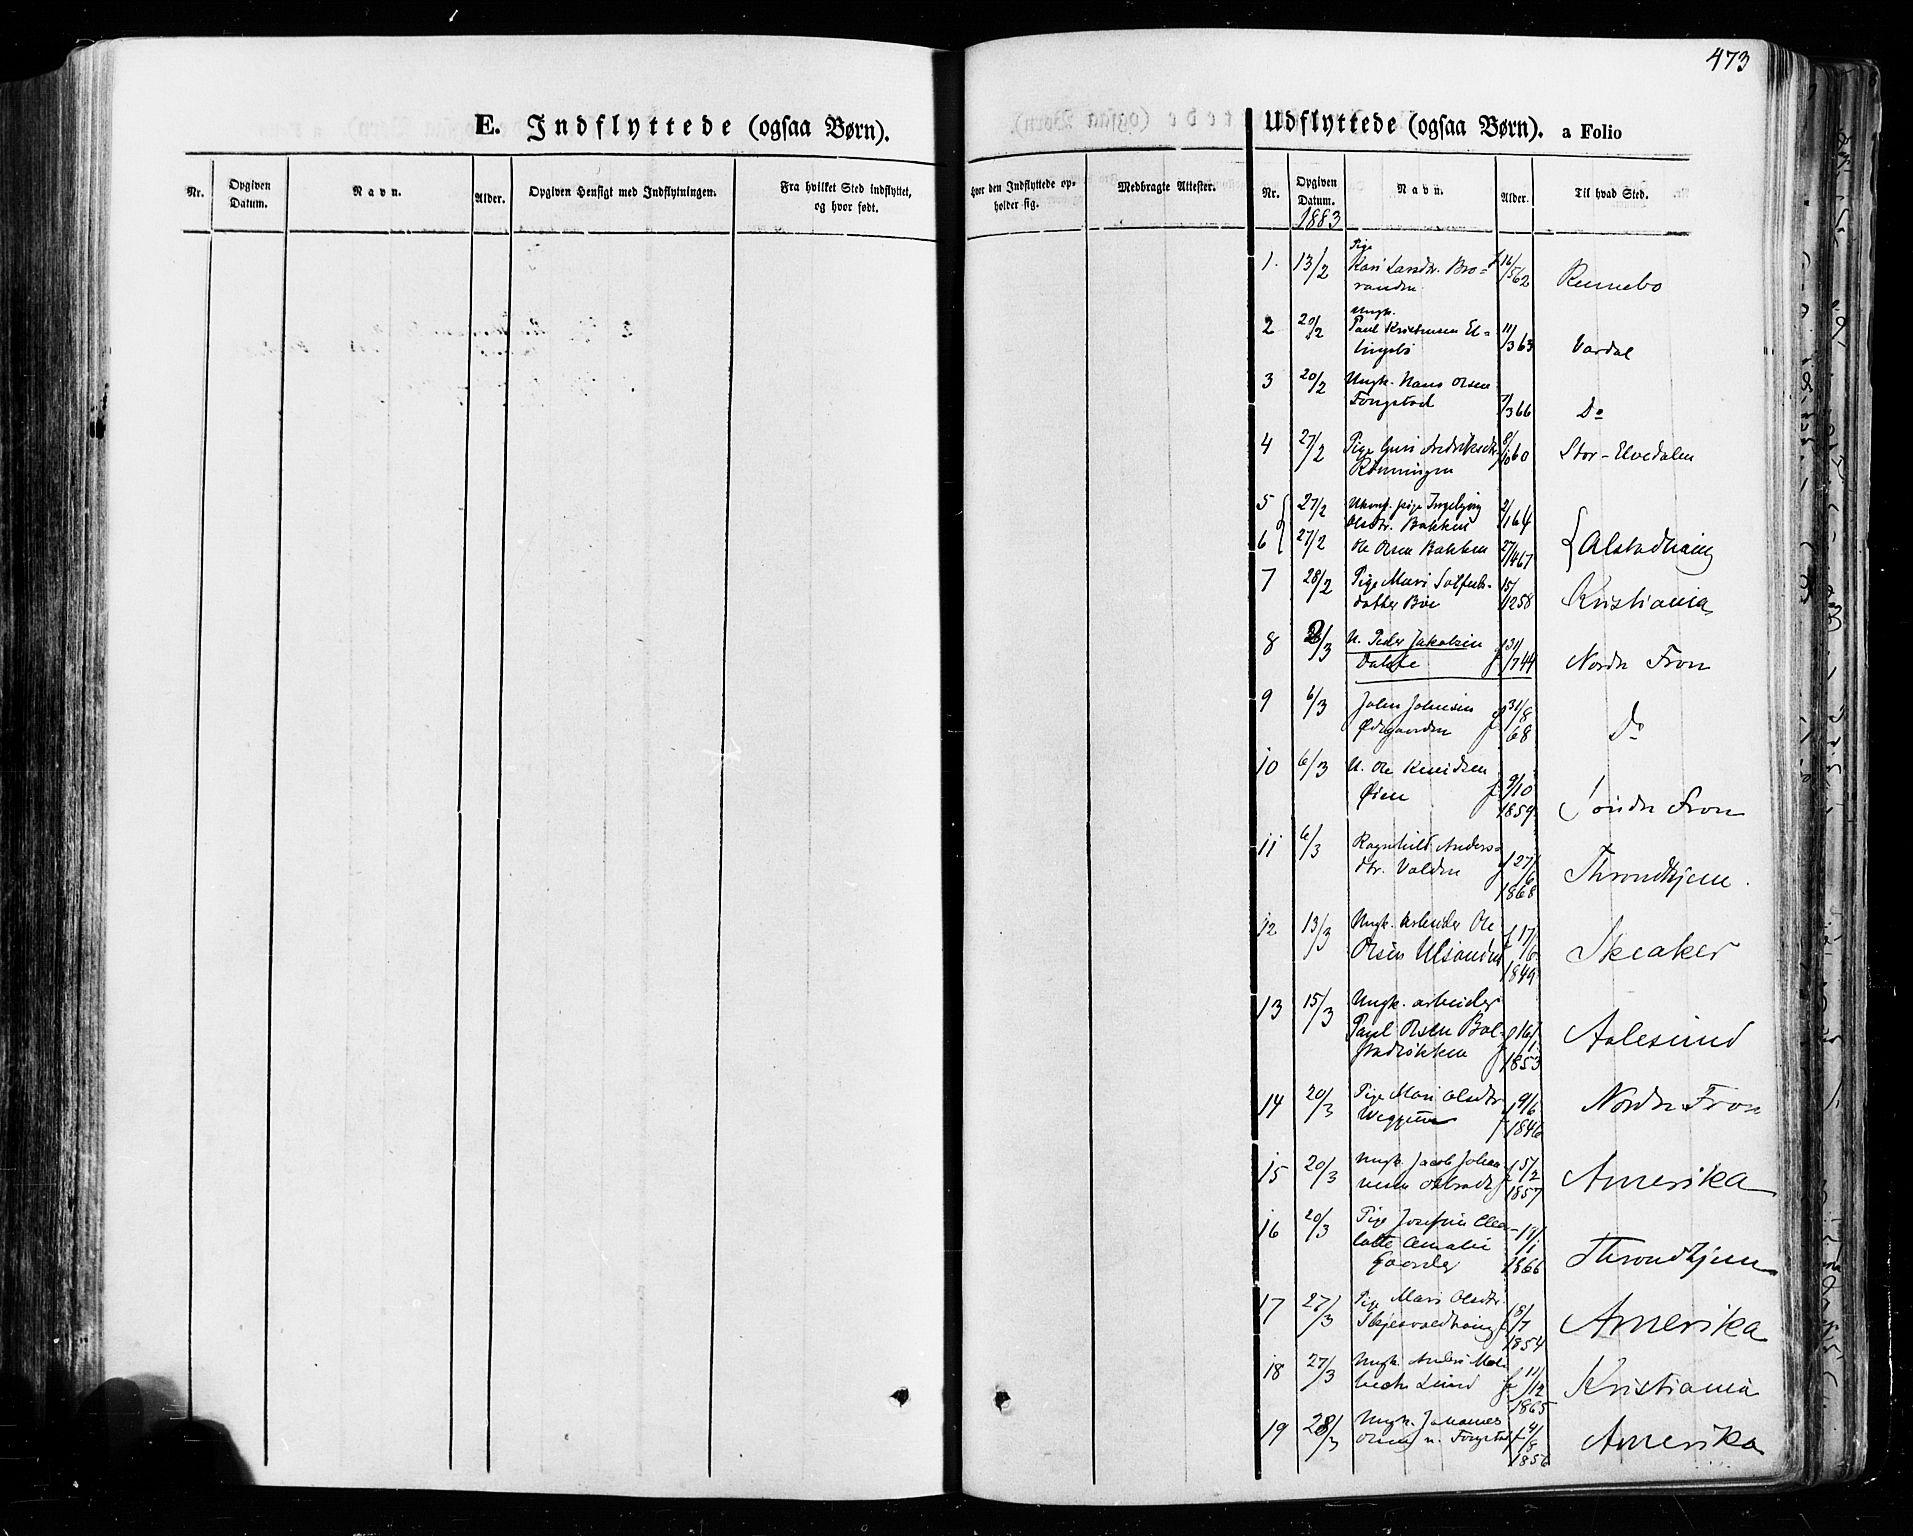 SAH, Vågå prestekontor, Ministerialbok nr. 7 /1, 1872-1886, s. 473